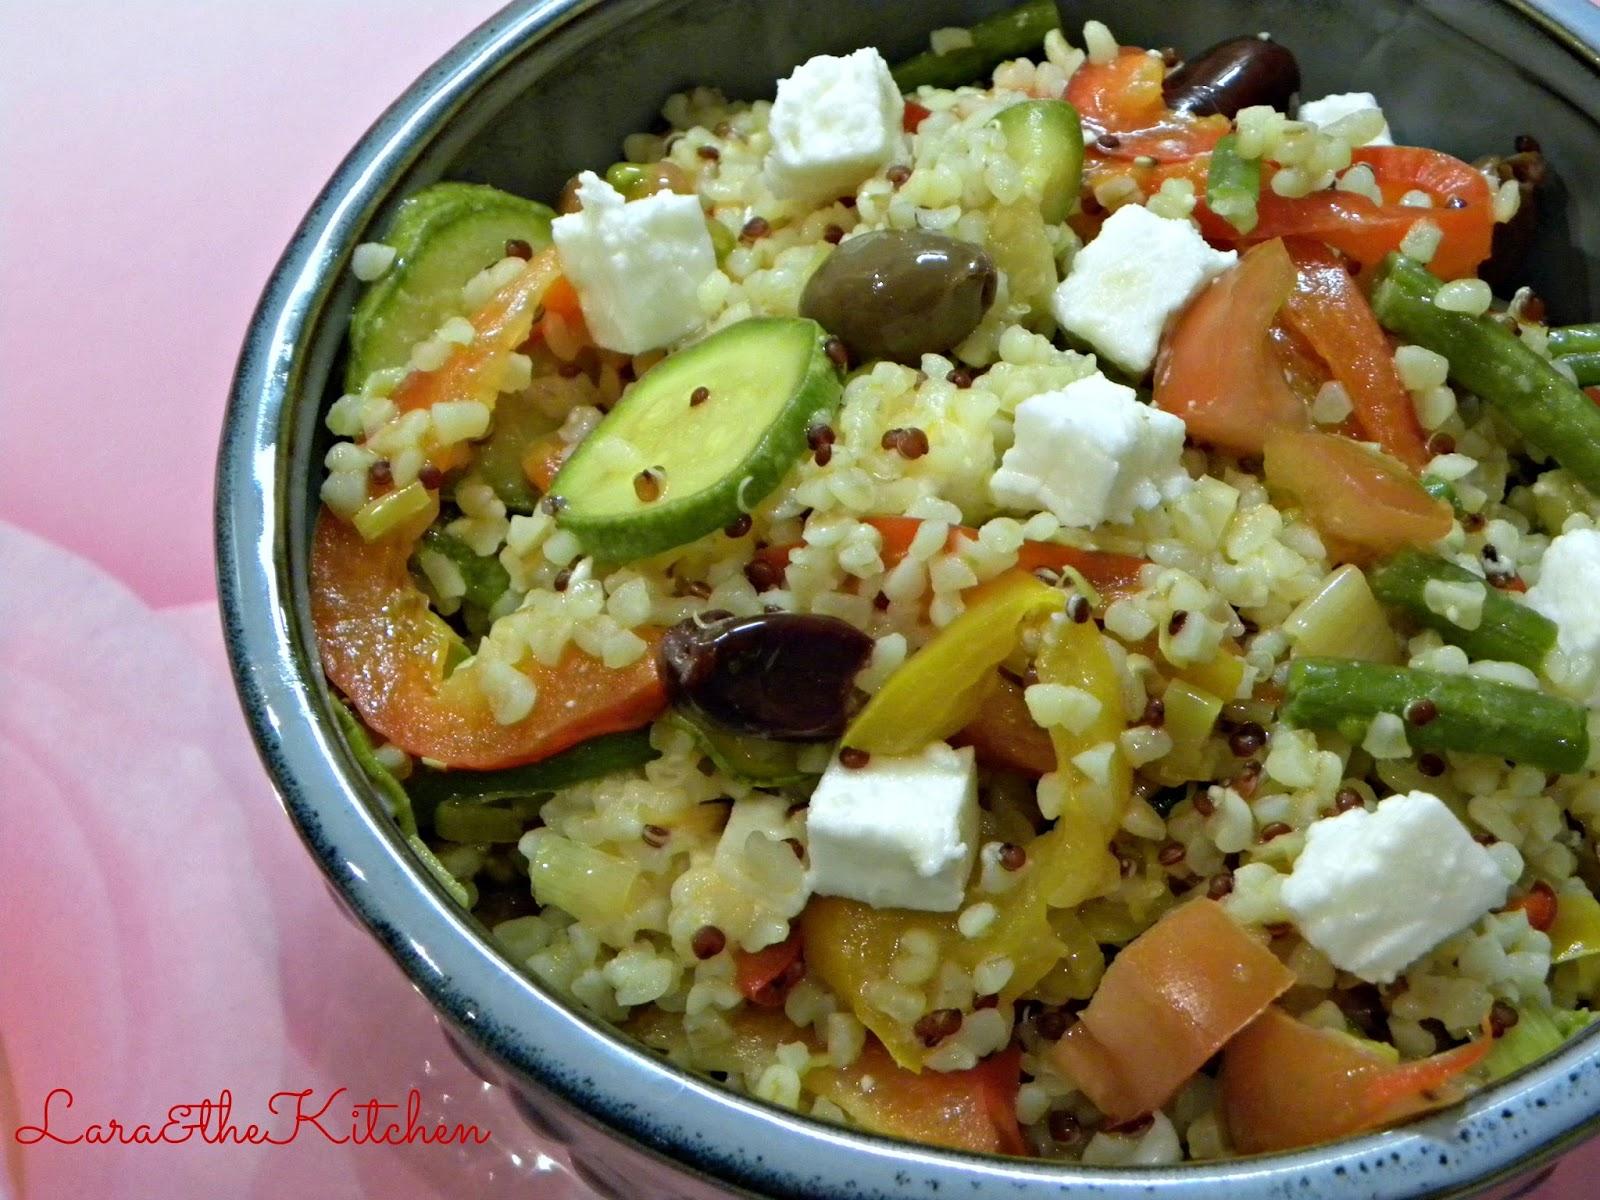 Ricetta Quinoa E Bulgur.Lara Thekitchen Insalata Di Bulgur E Quinoa Alle Verdure E Feta